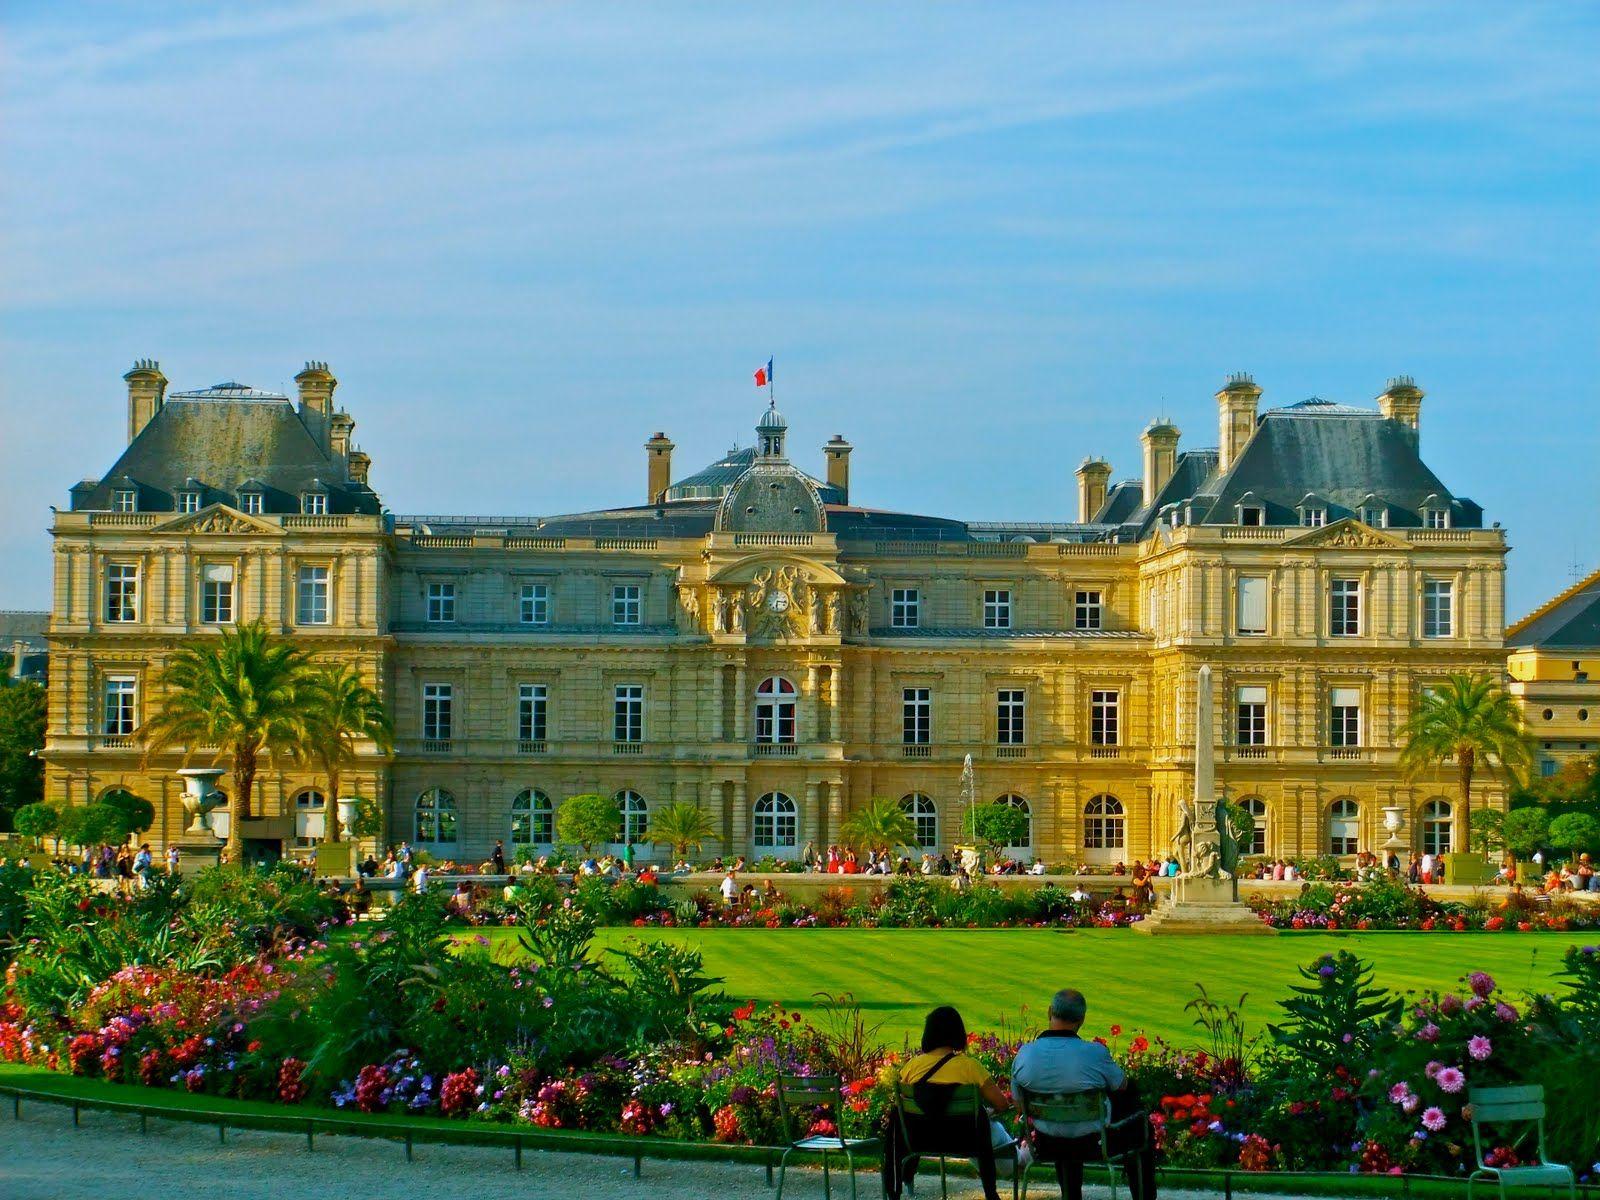 Hotel Jardin Du Luxembourg | Romantic Honeymoon, Cool Places ... tout Jardin De Luxembourg Hotel